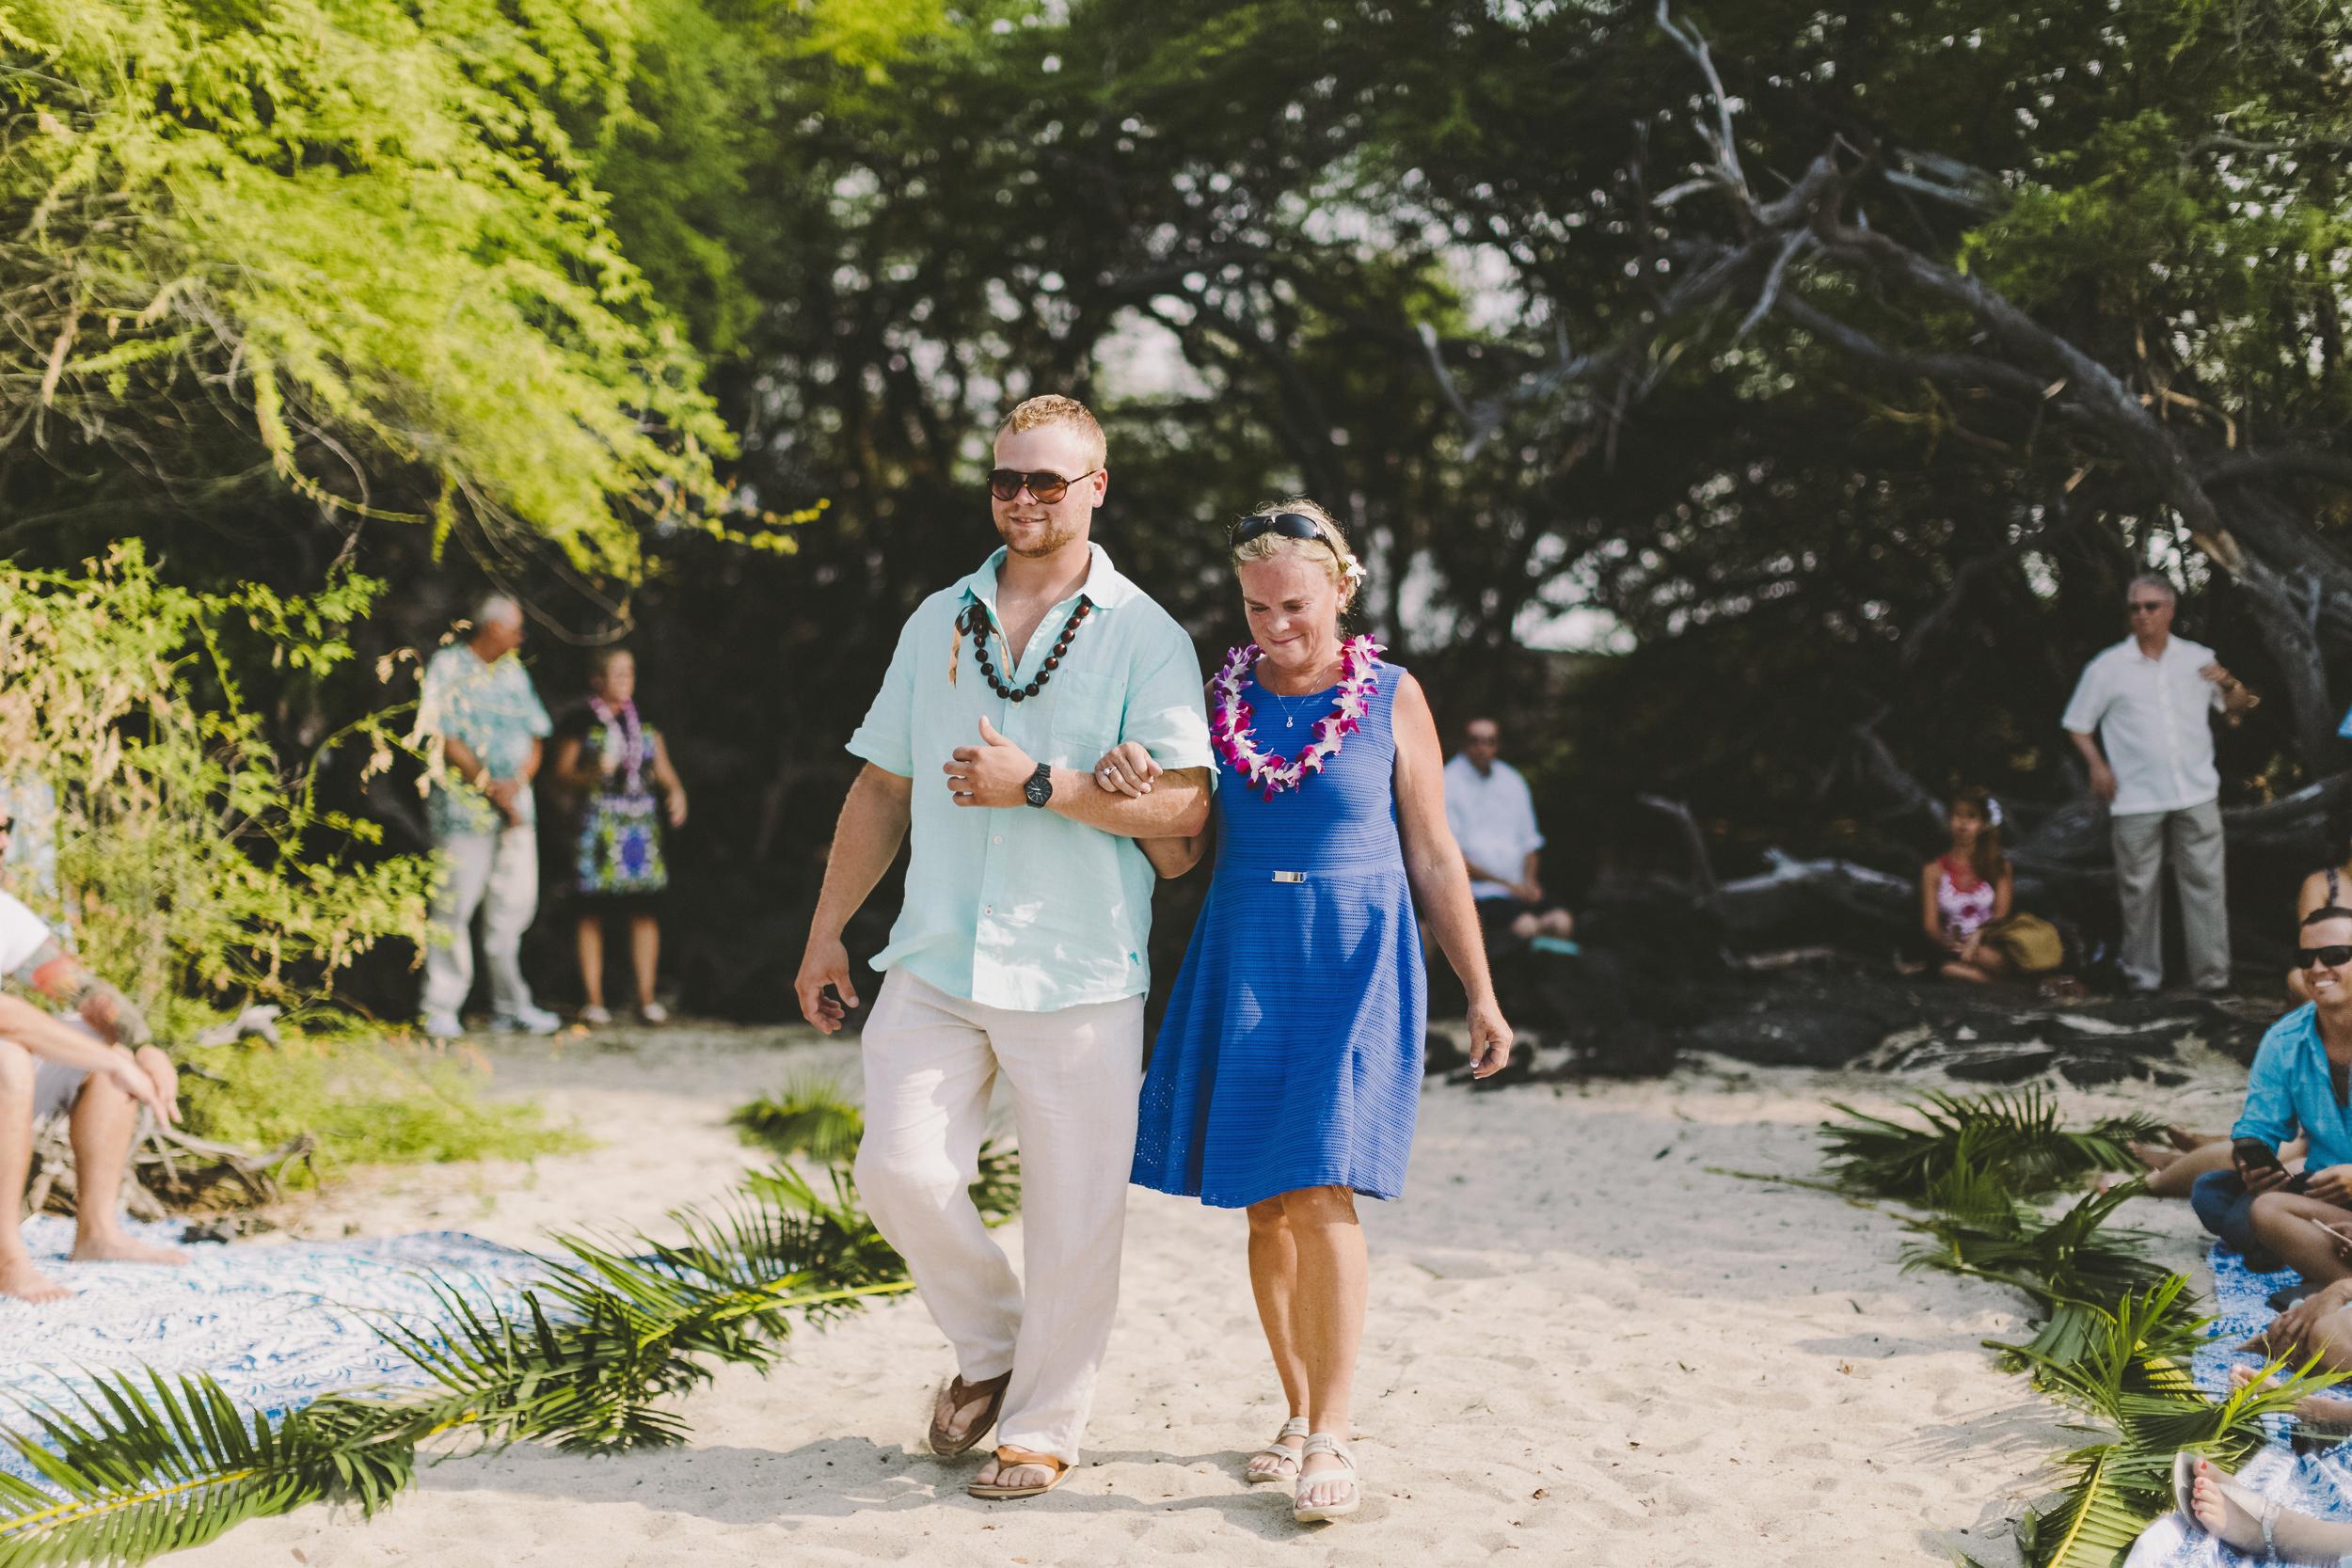 angie-diaz-photography-hawaii-wedding-photographer-kelli-jay-46.jpg